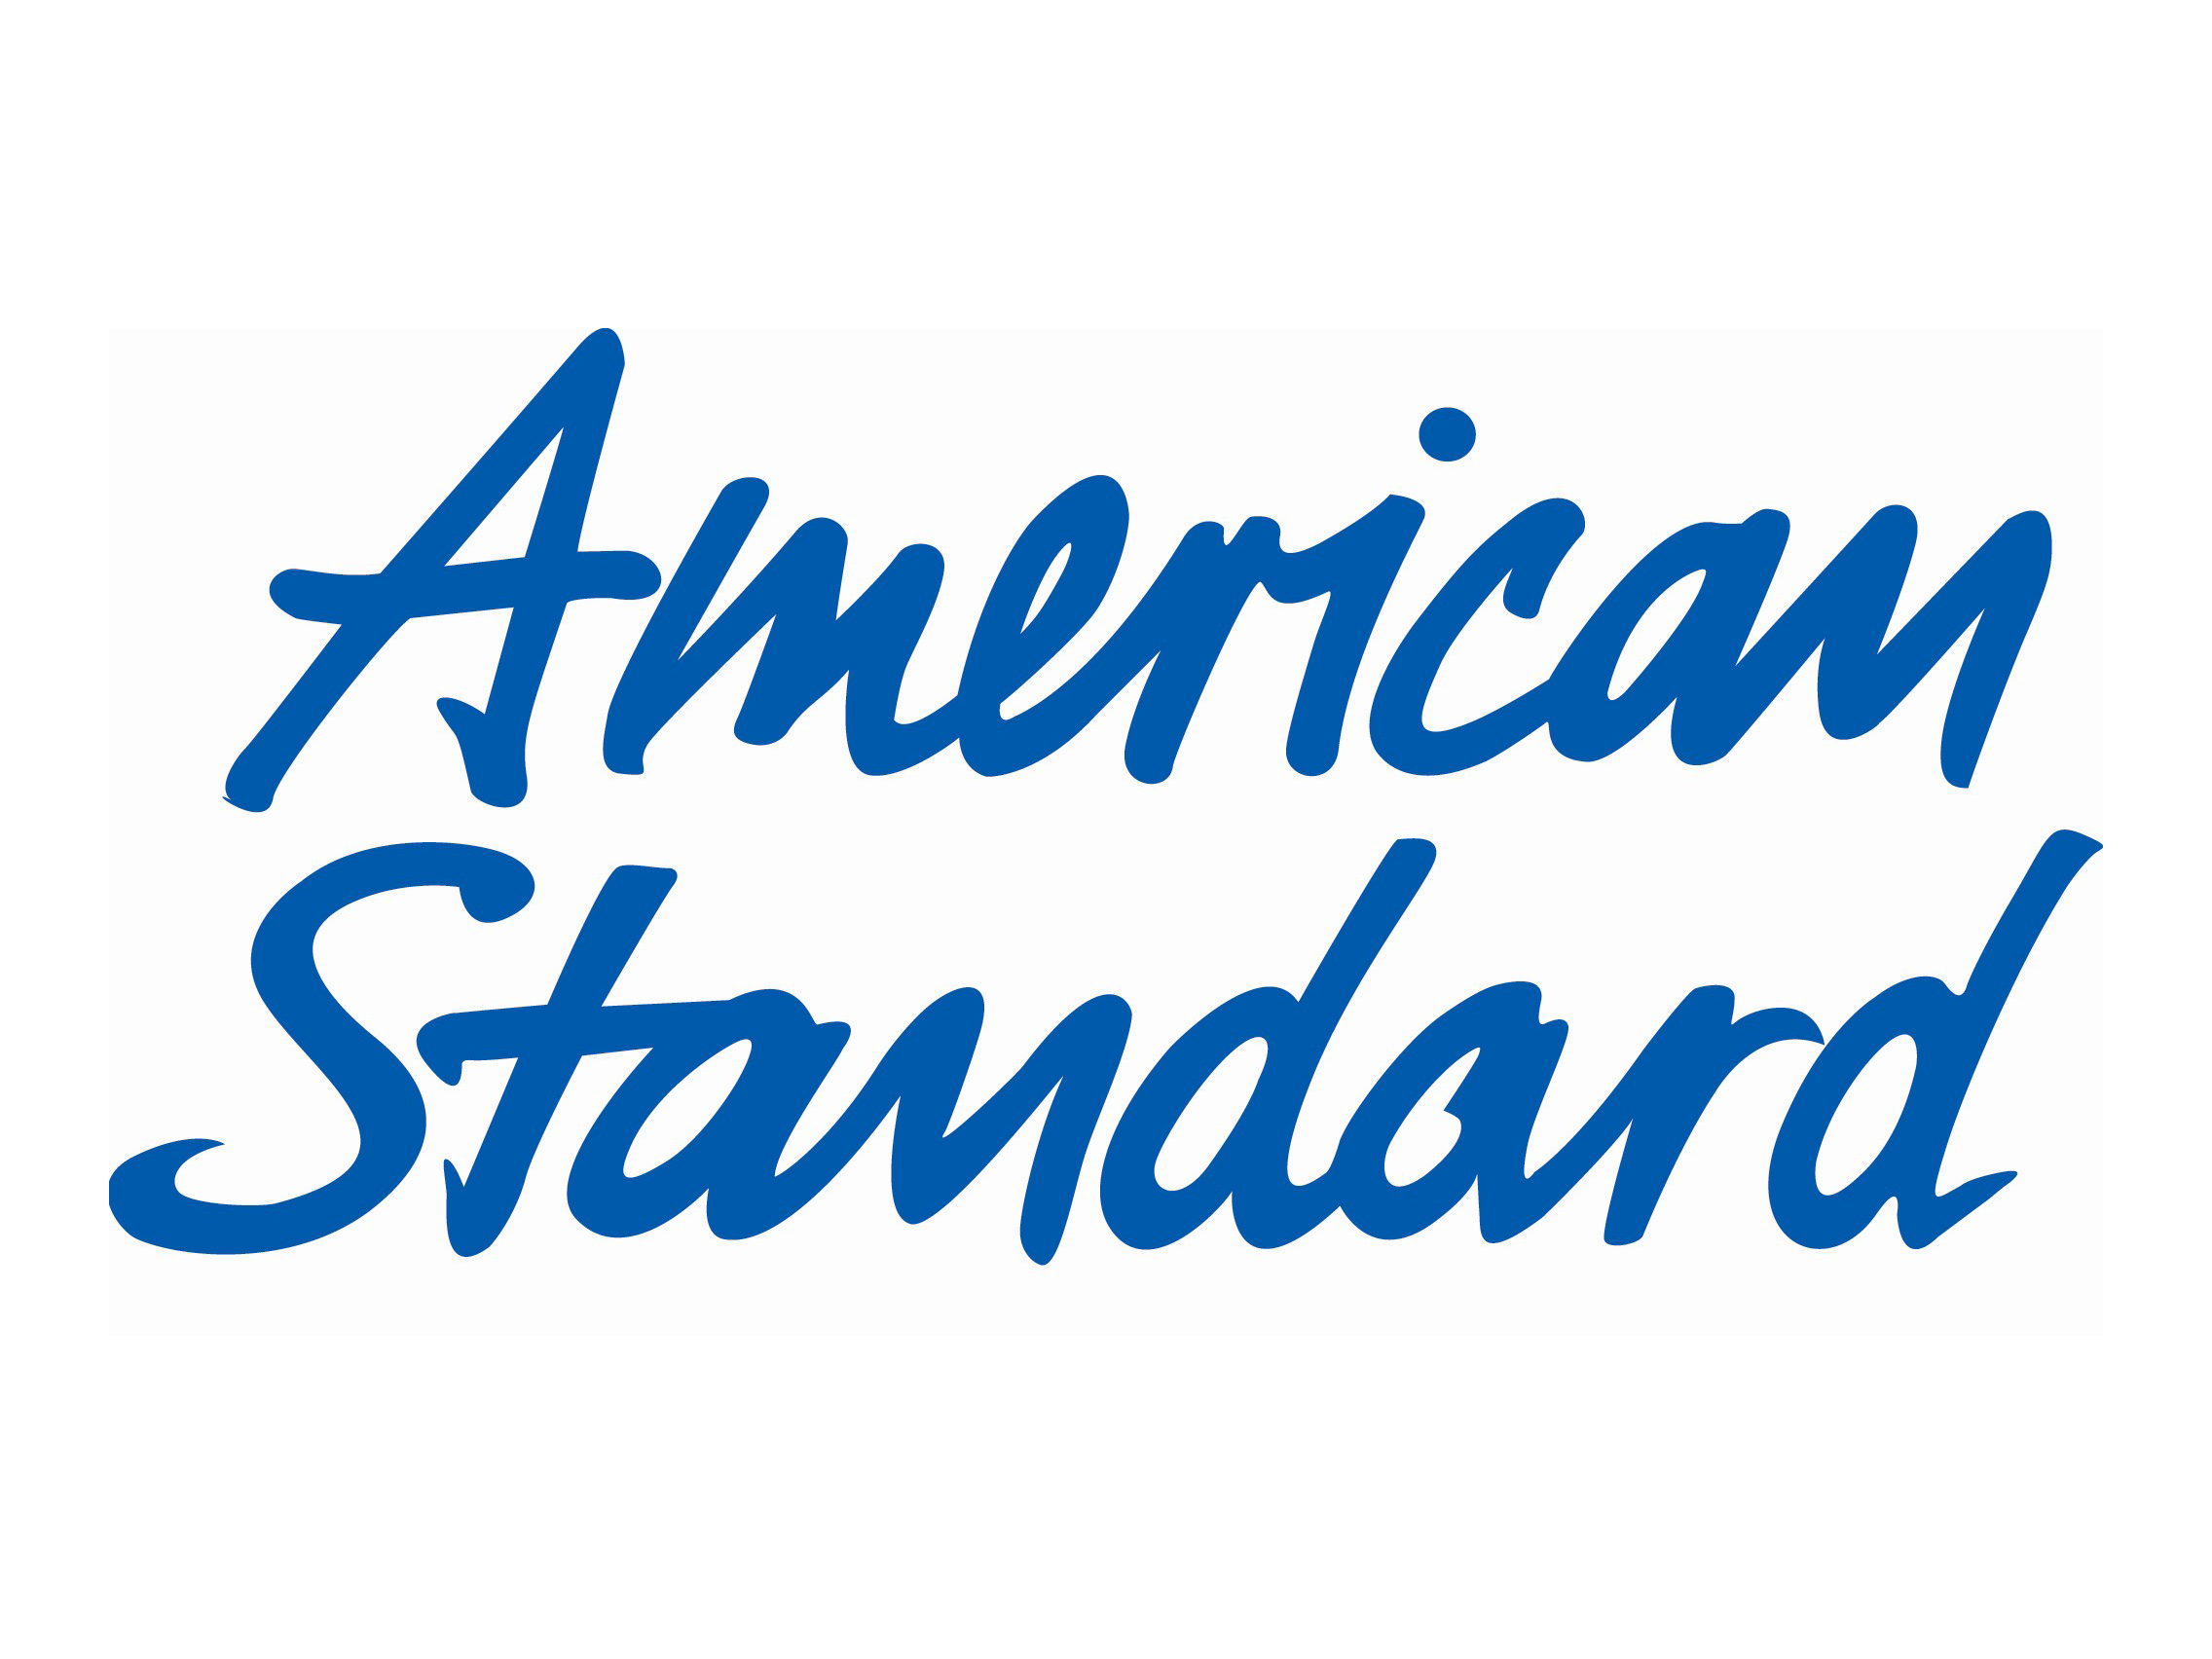 American Standard Customer Service Number 800-442-1902